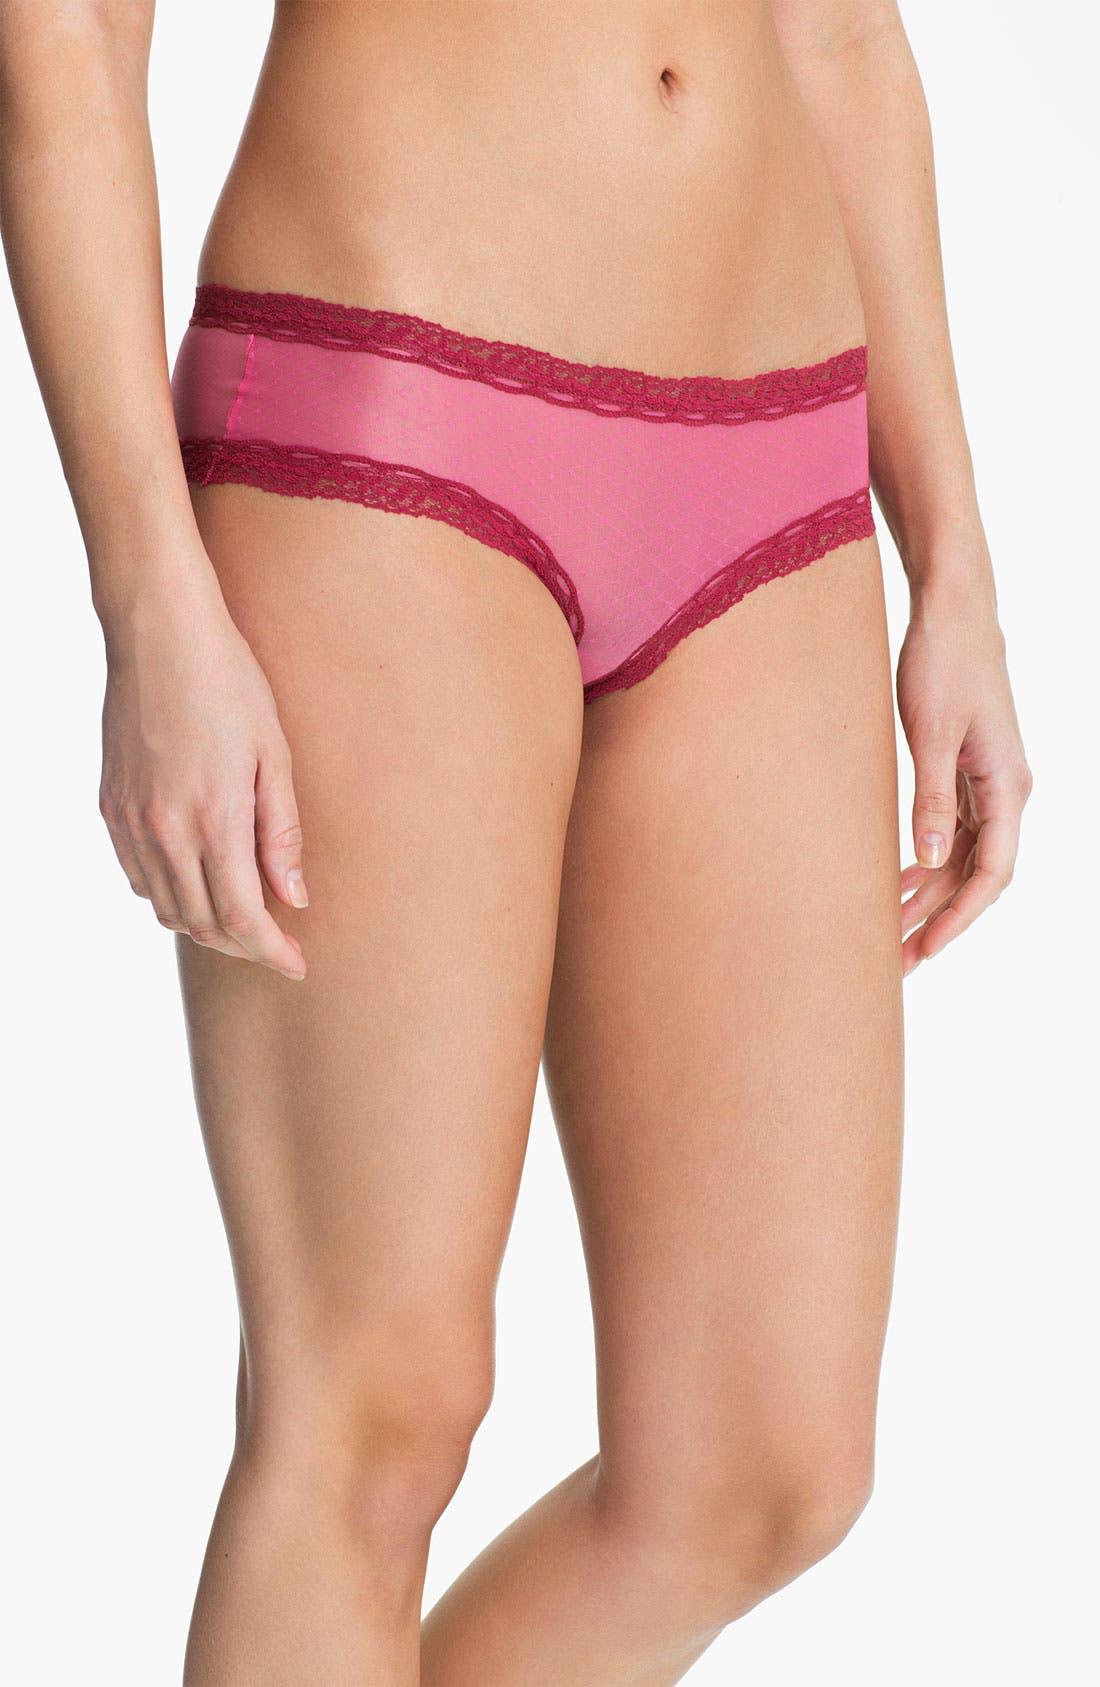 Alternate Image 1 Selected - DKNY 'Modern Lights' Mid-Rise Hipster Bikini